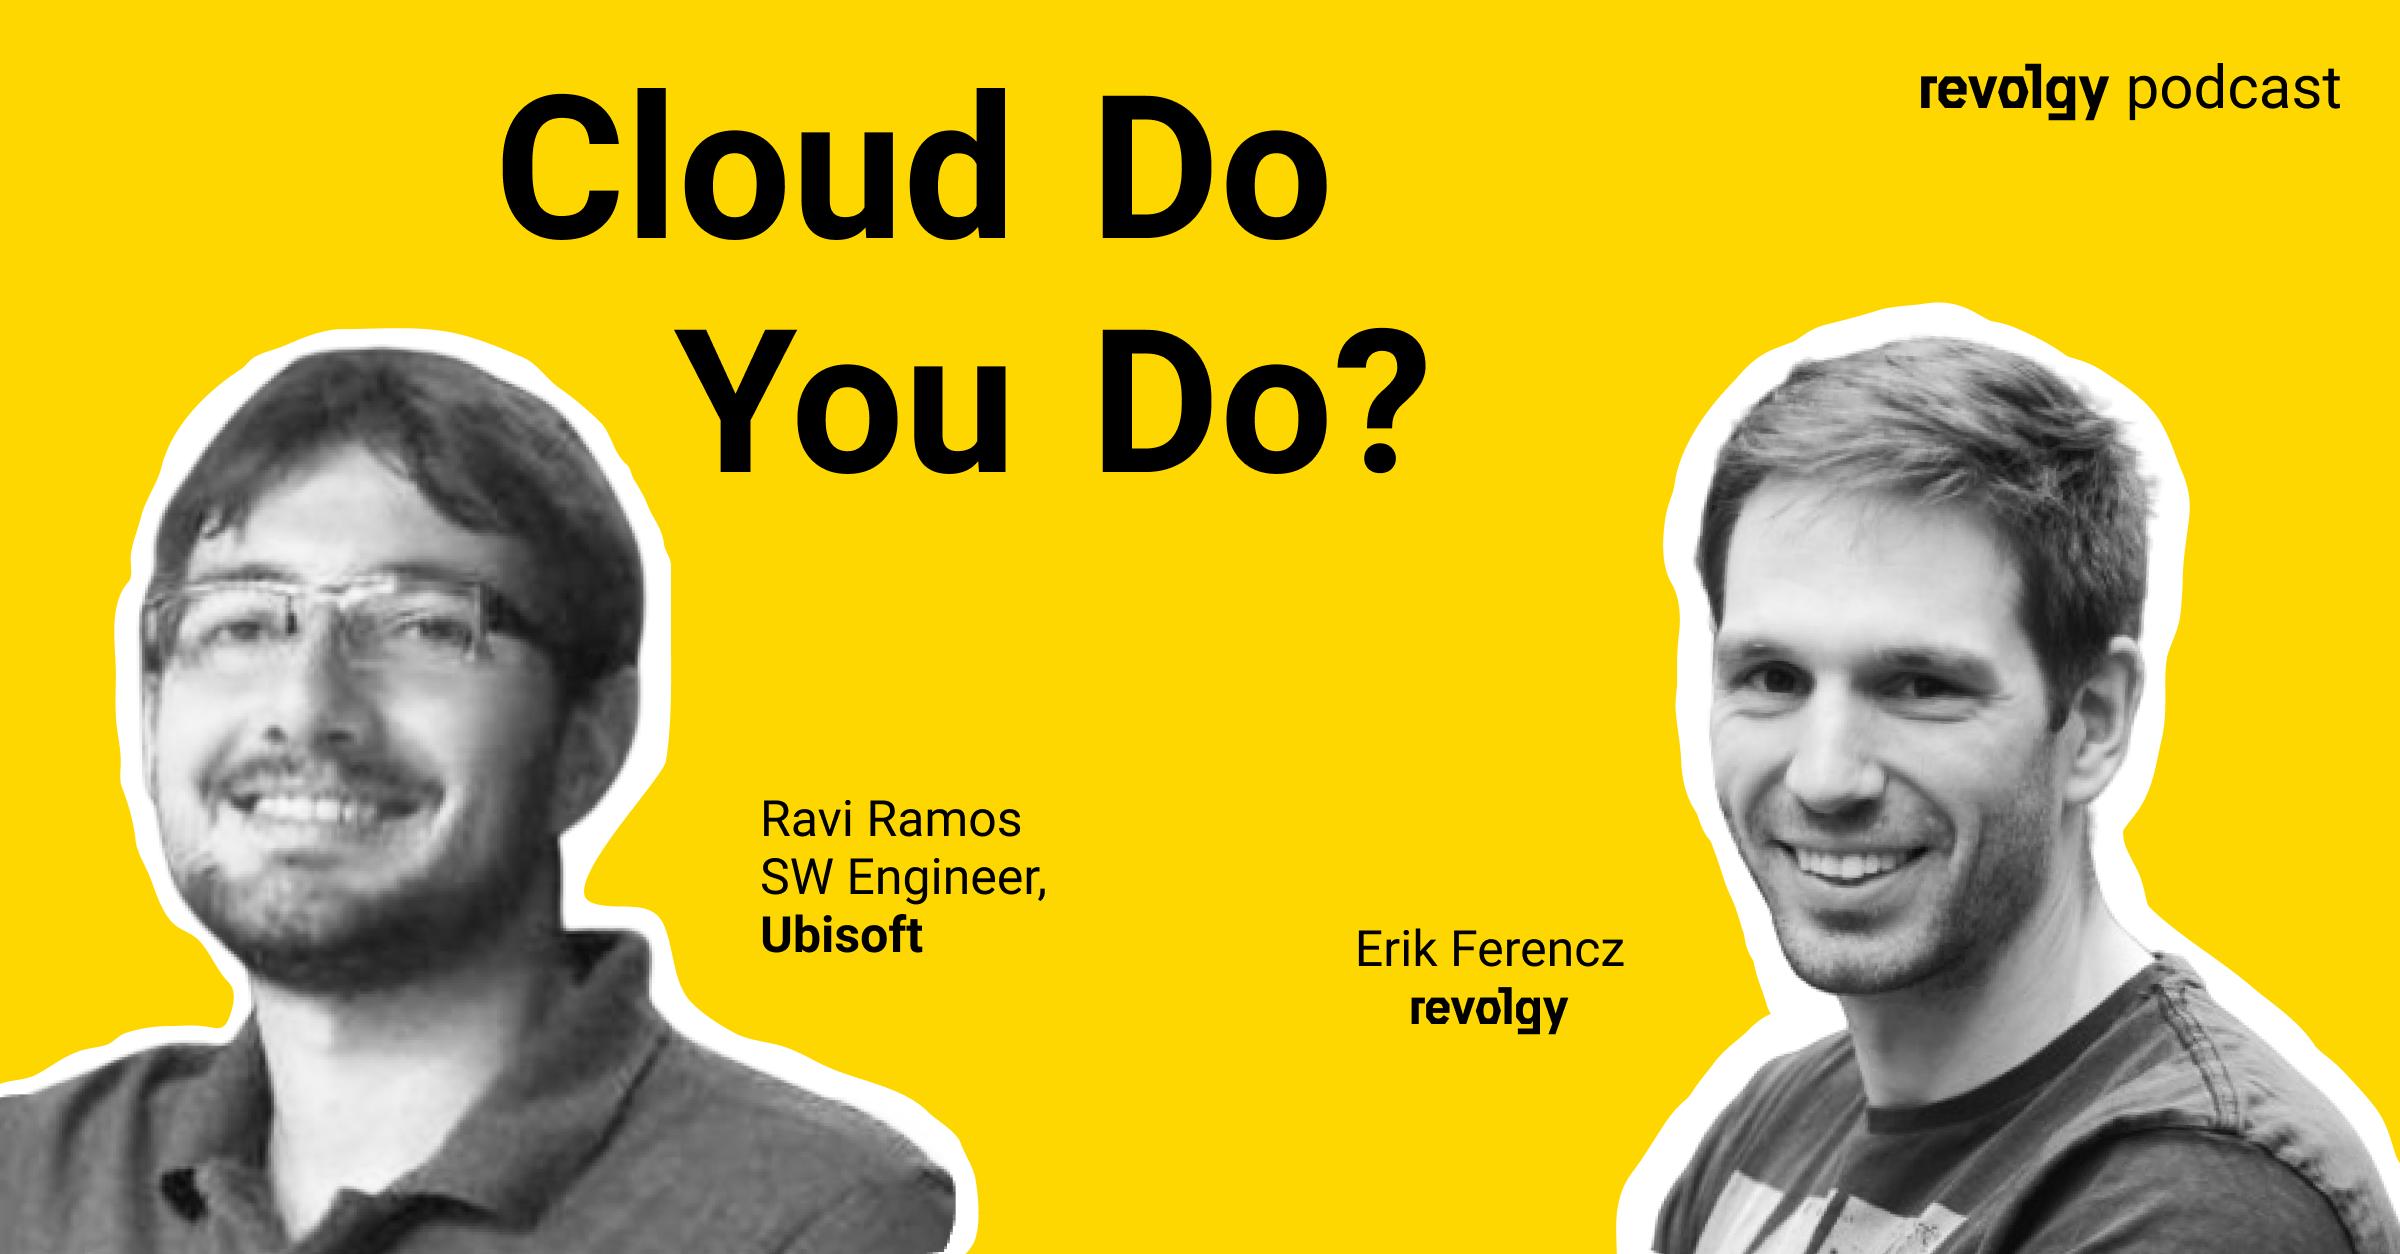 Cloud Do You Do, Ravi Ramos?